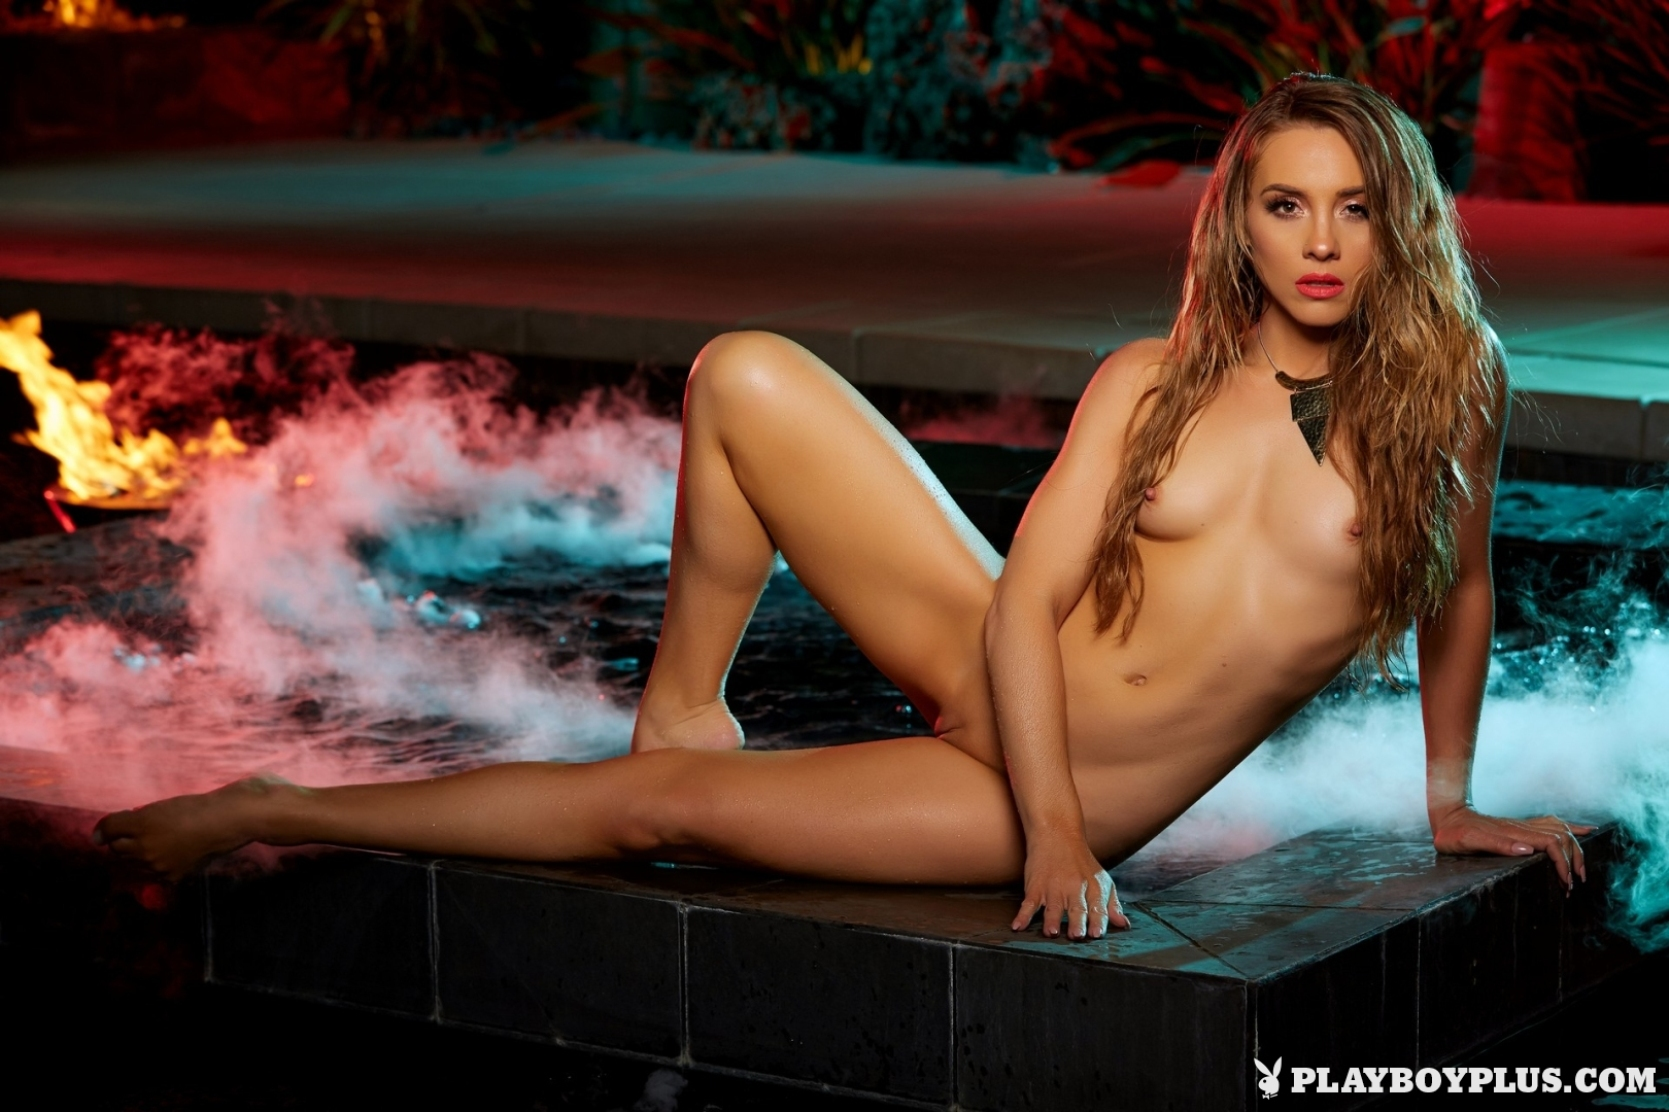 Playboy Plus | Lauryn Elaine in Picking up Steam 15